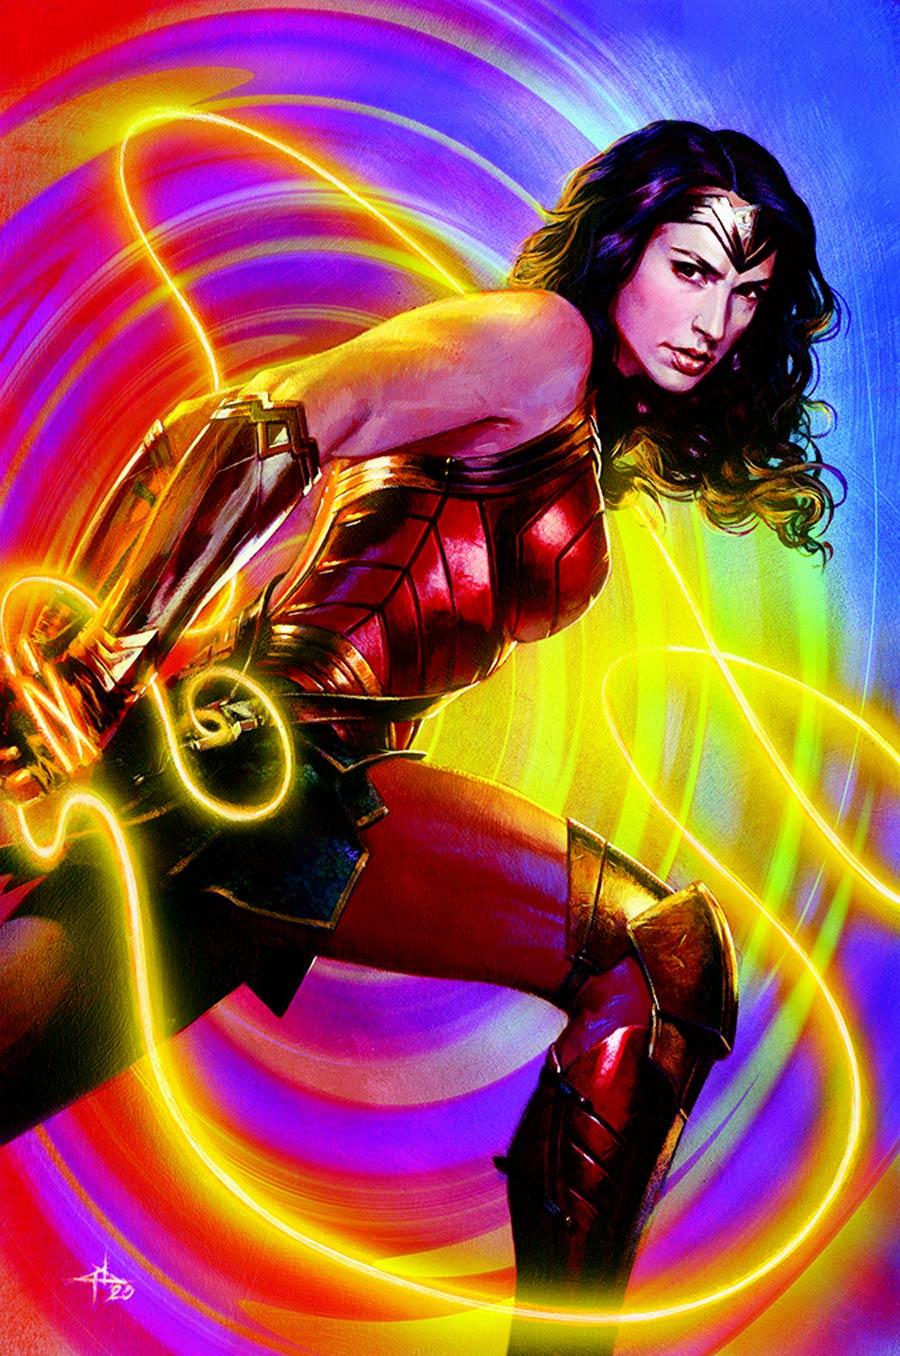 10//13//2020 SUPERMAN #26 CVR C GABRIELE DELL OTTO WONDER WOMAN 1984 VAR